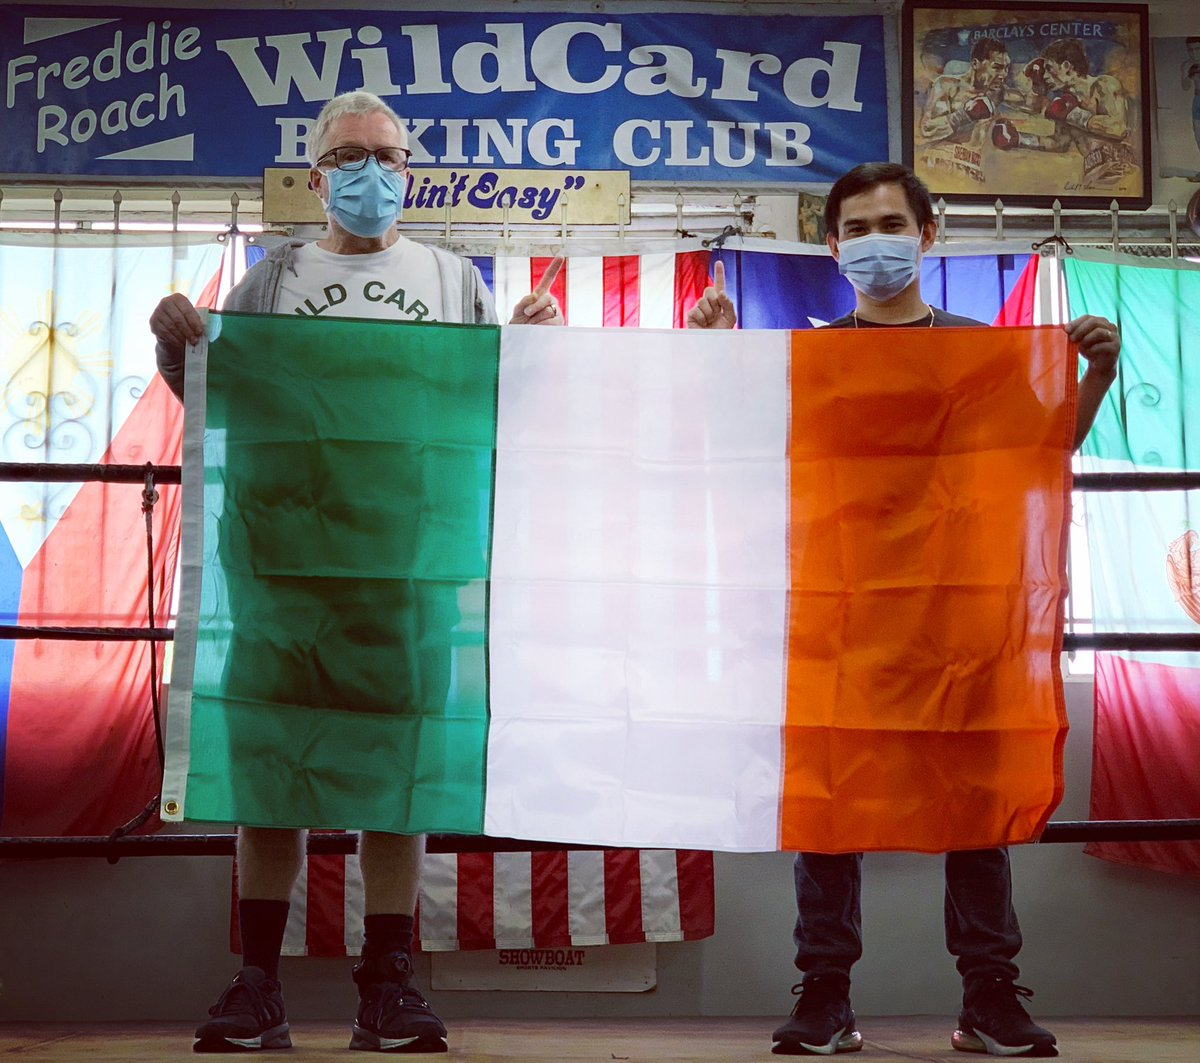 I did not forget - Happy St. Patrick's Day! @WildCardBoxing1 @Aaronmckenna99 @stevie_mckenna #CallumWalsh @KnuckleheadSean #MarvinSomodio @PepeReillyBox @WCBstore #StPatricksDay #wildcardboxing #wildcardboxingclub #LuckOfTheIrish #Ireland #Irish https://t.co/6KMlrPEpAU